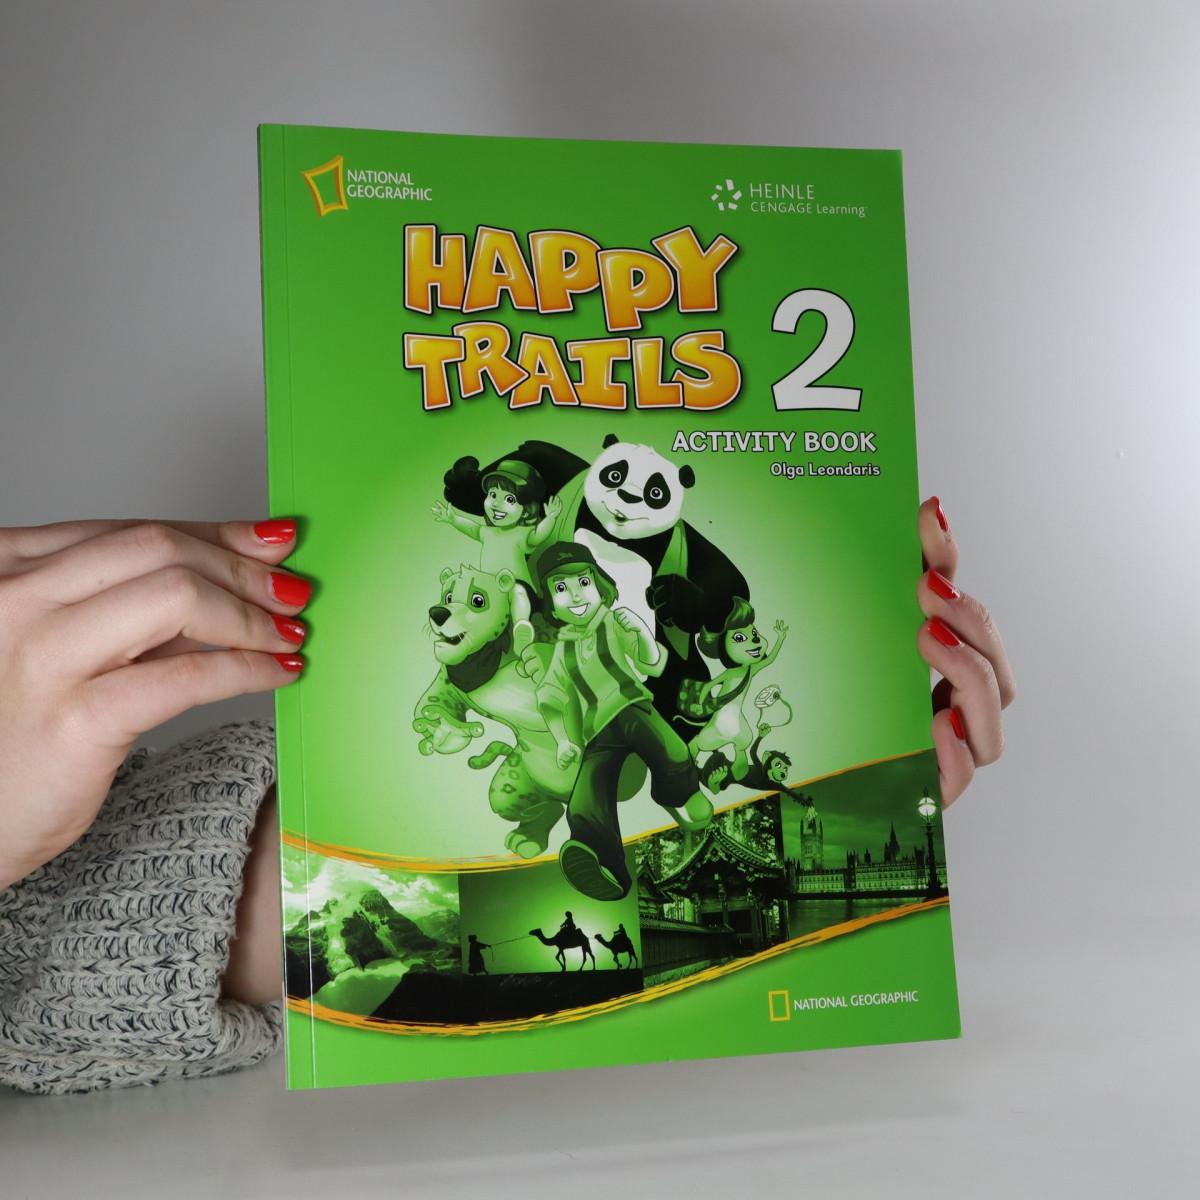 antikvární kniha Happy Trails Activity Book 2, neuveden